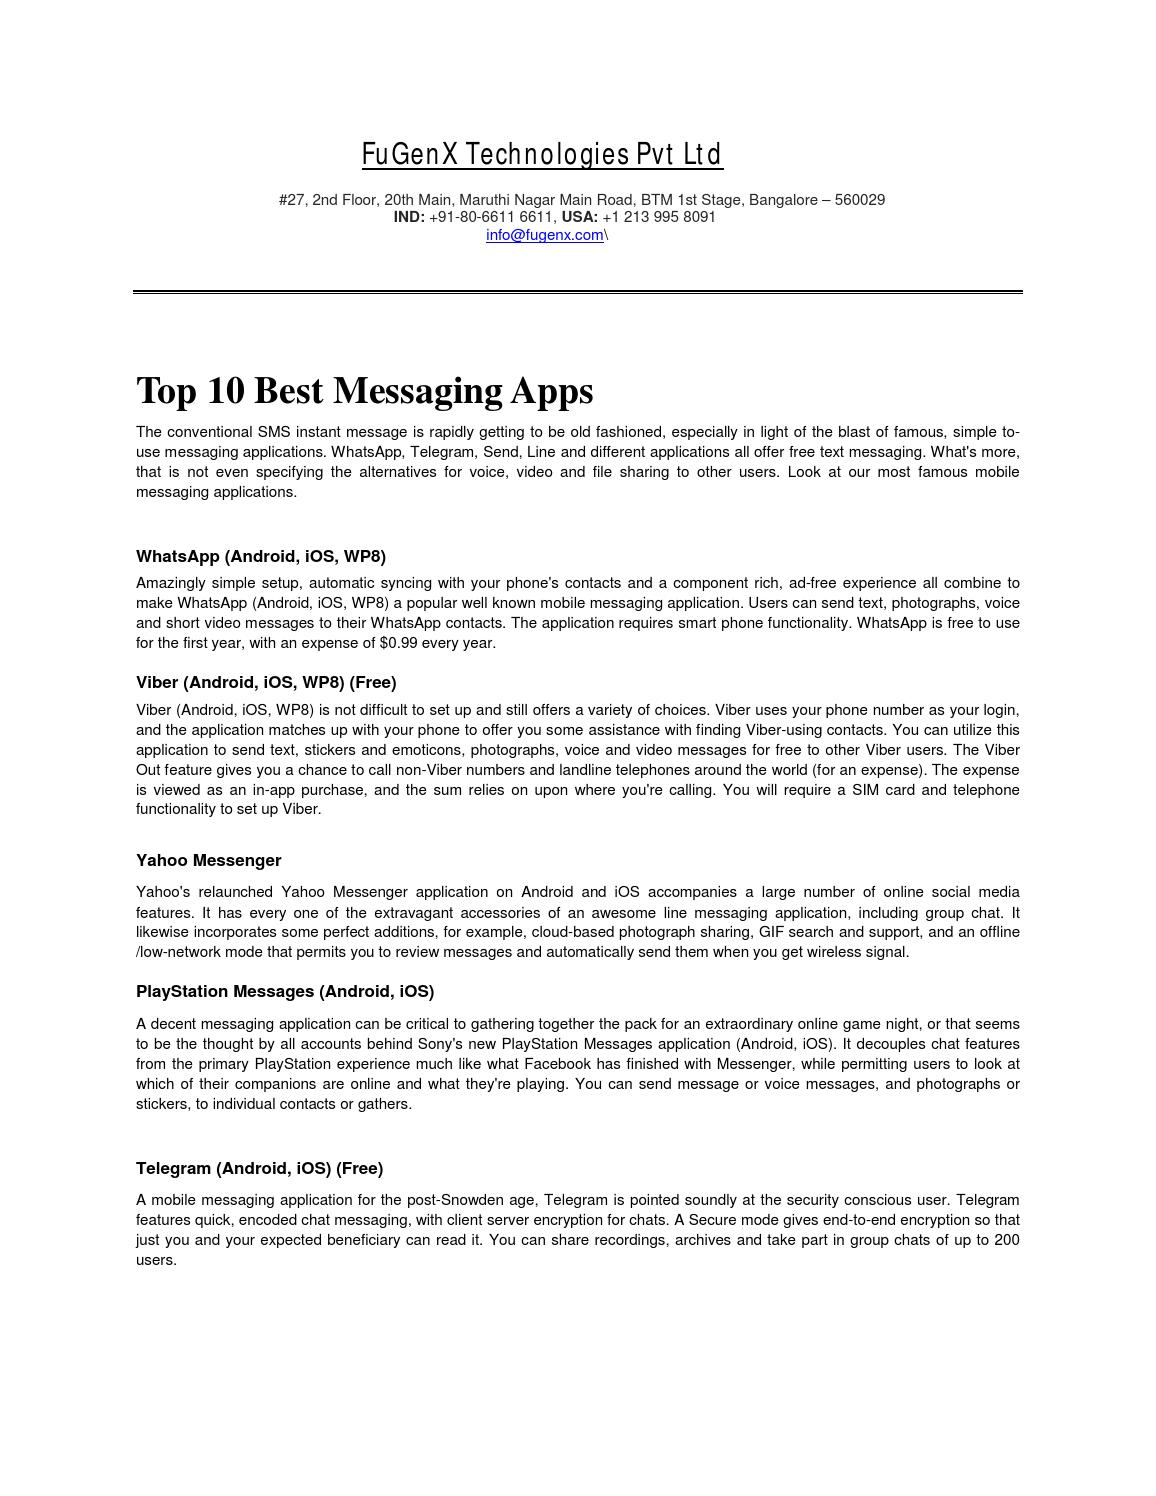 10 best msg apps by krishna modi - issuu